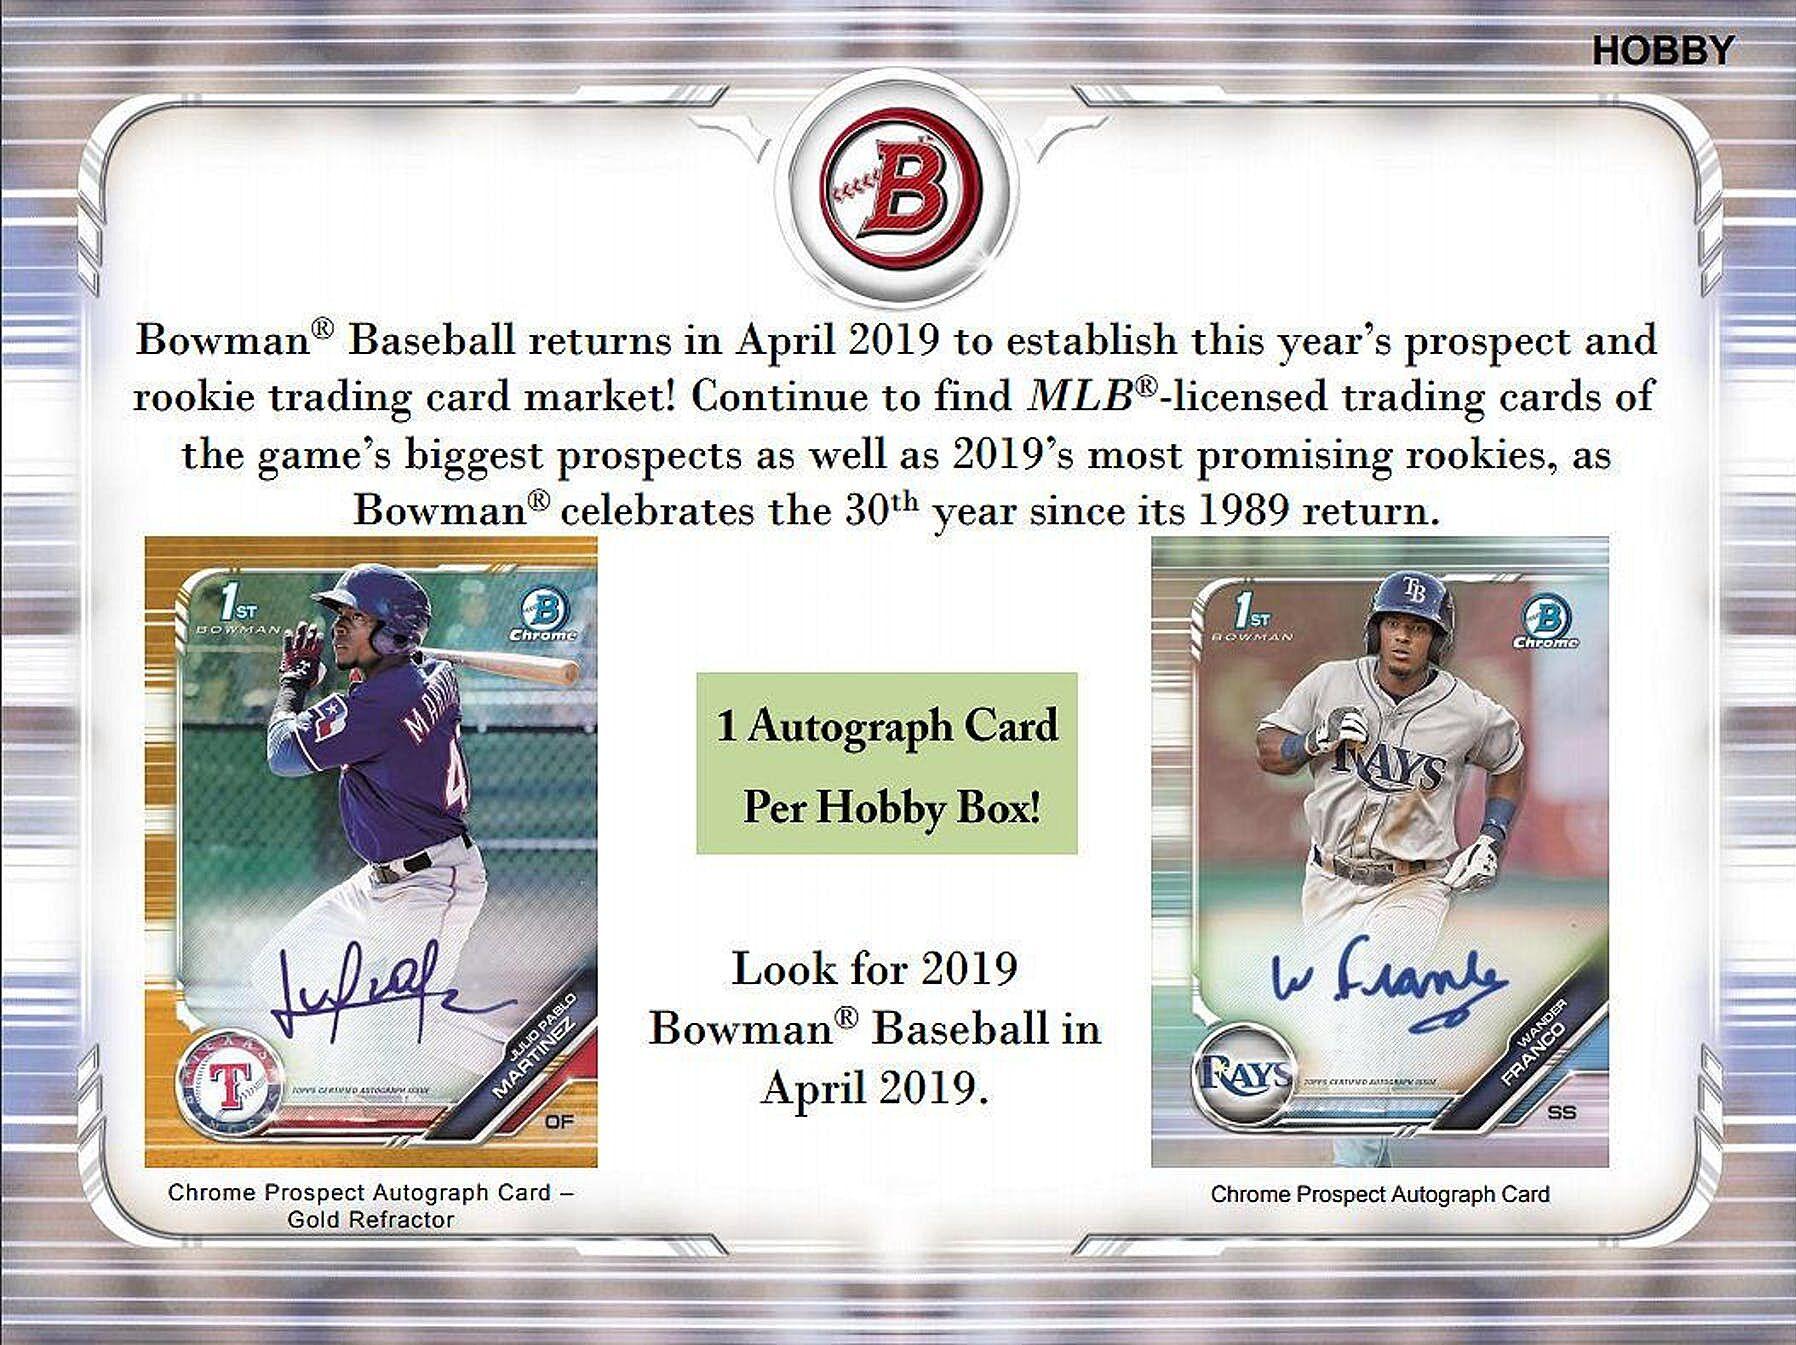 Bowman Baseball 2019 Review